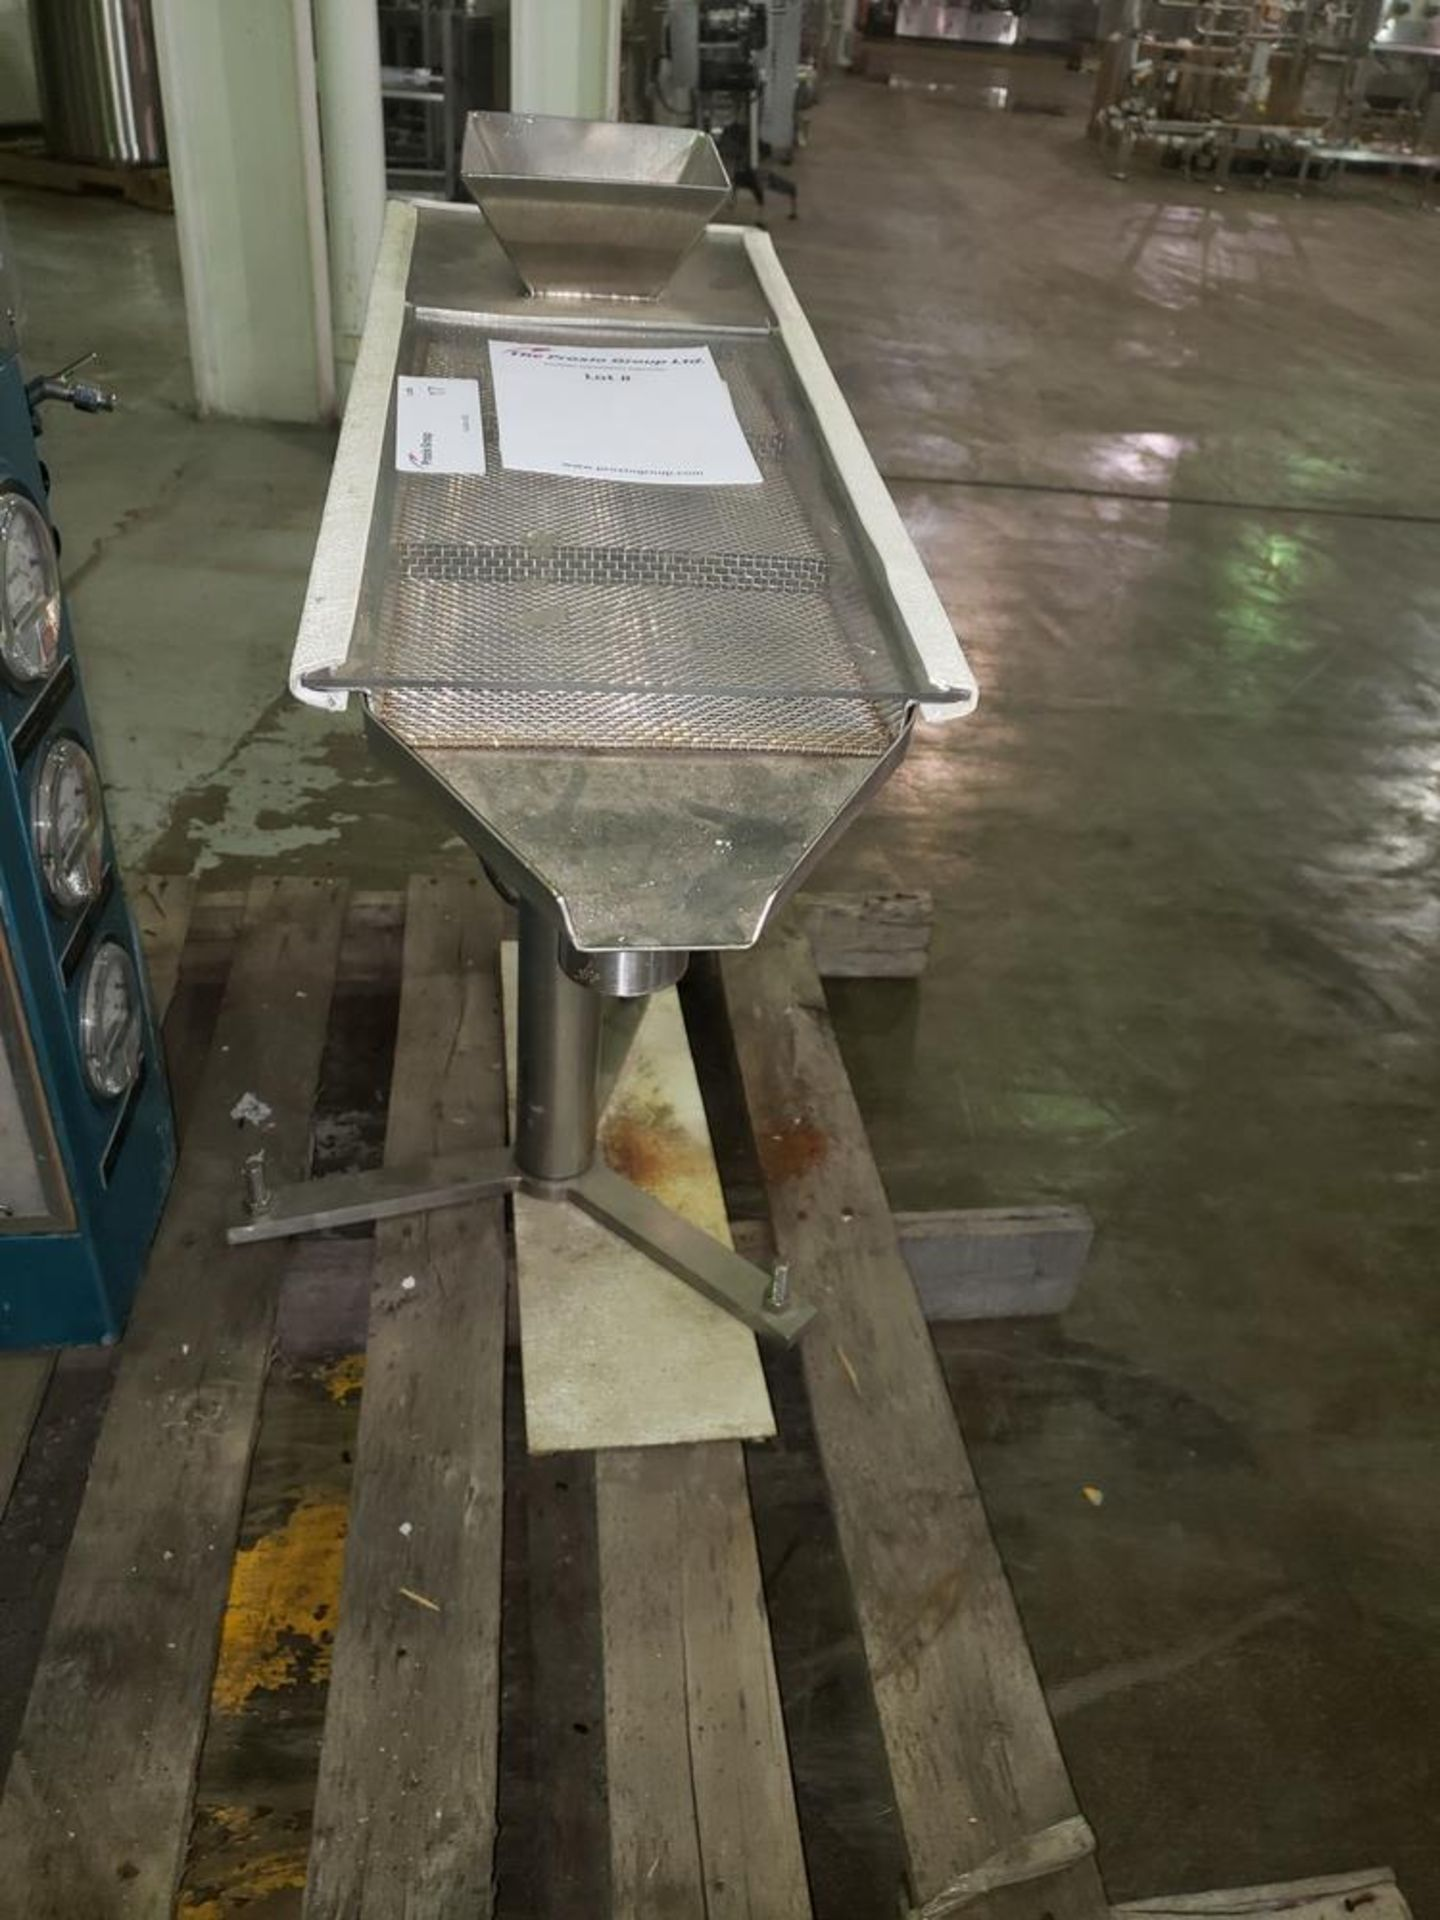 Lot 17 - FMC Syntron magnetic feeder, model CSCR-1B-1, 115 volt, 50/60 hz, serial# P30596.